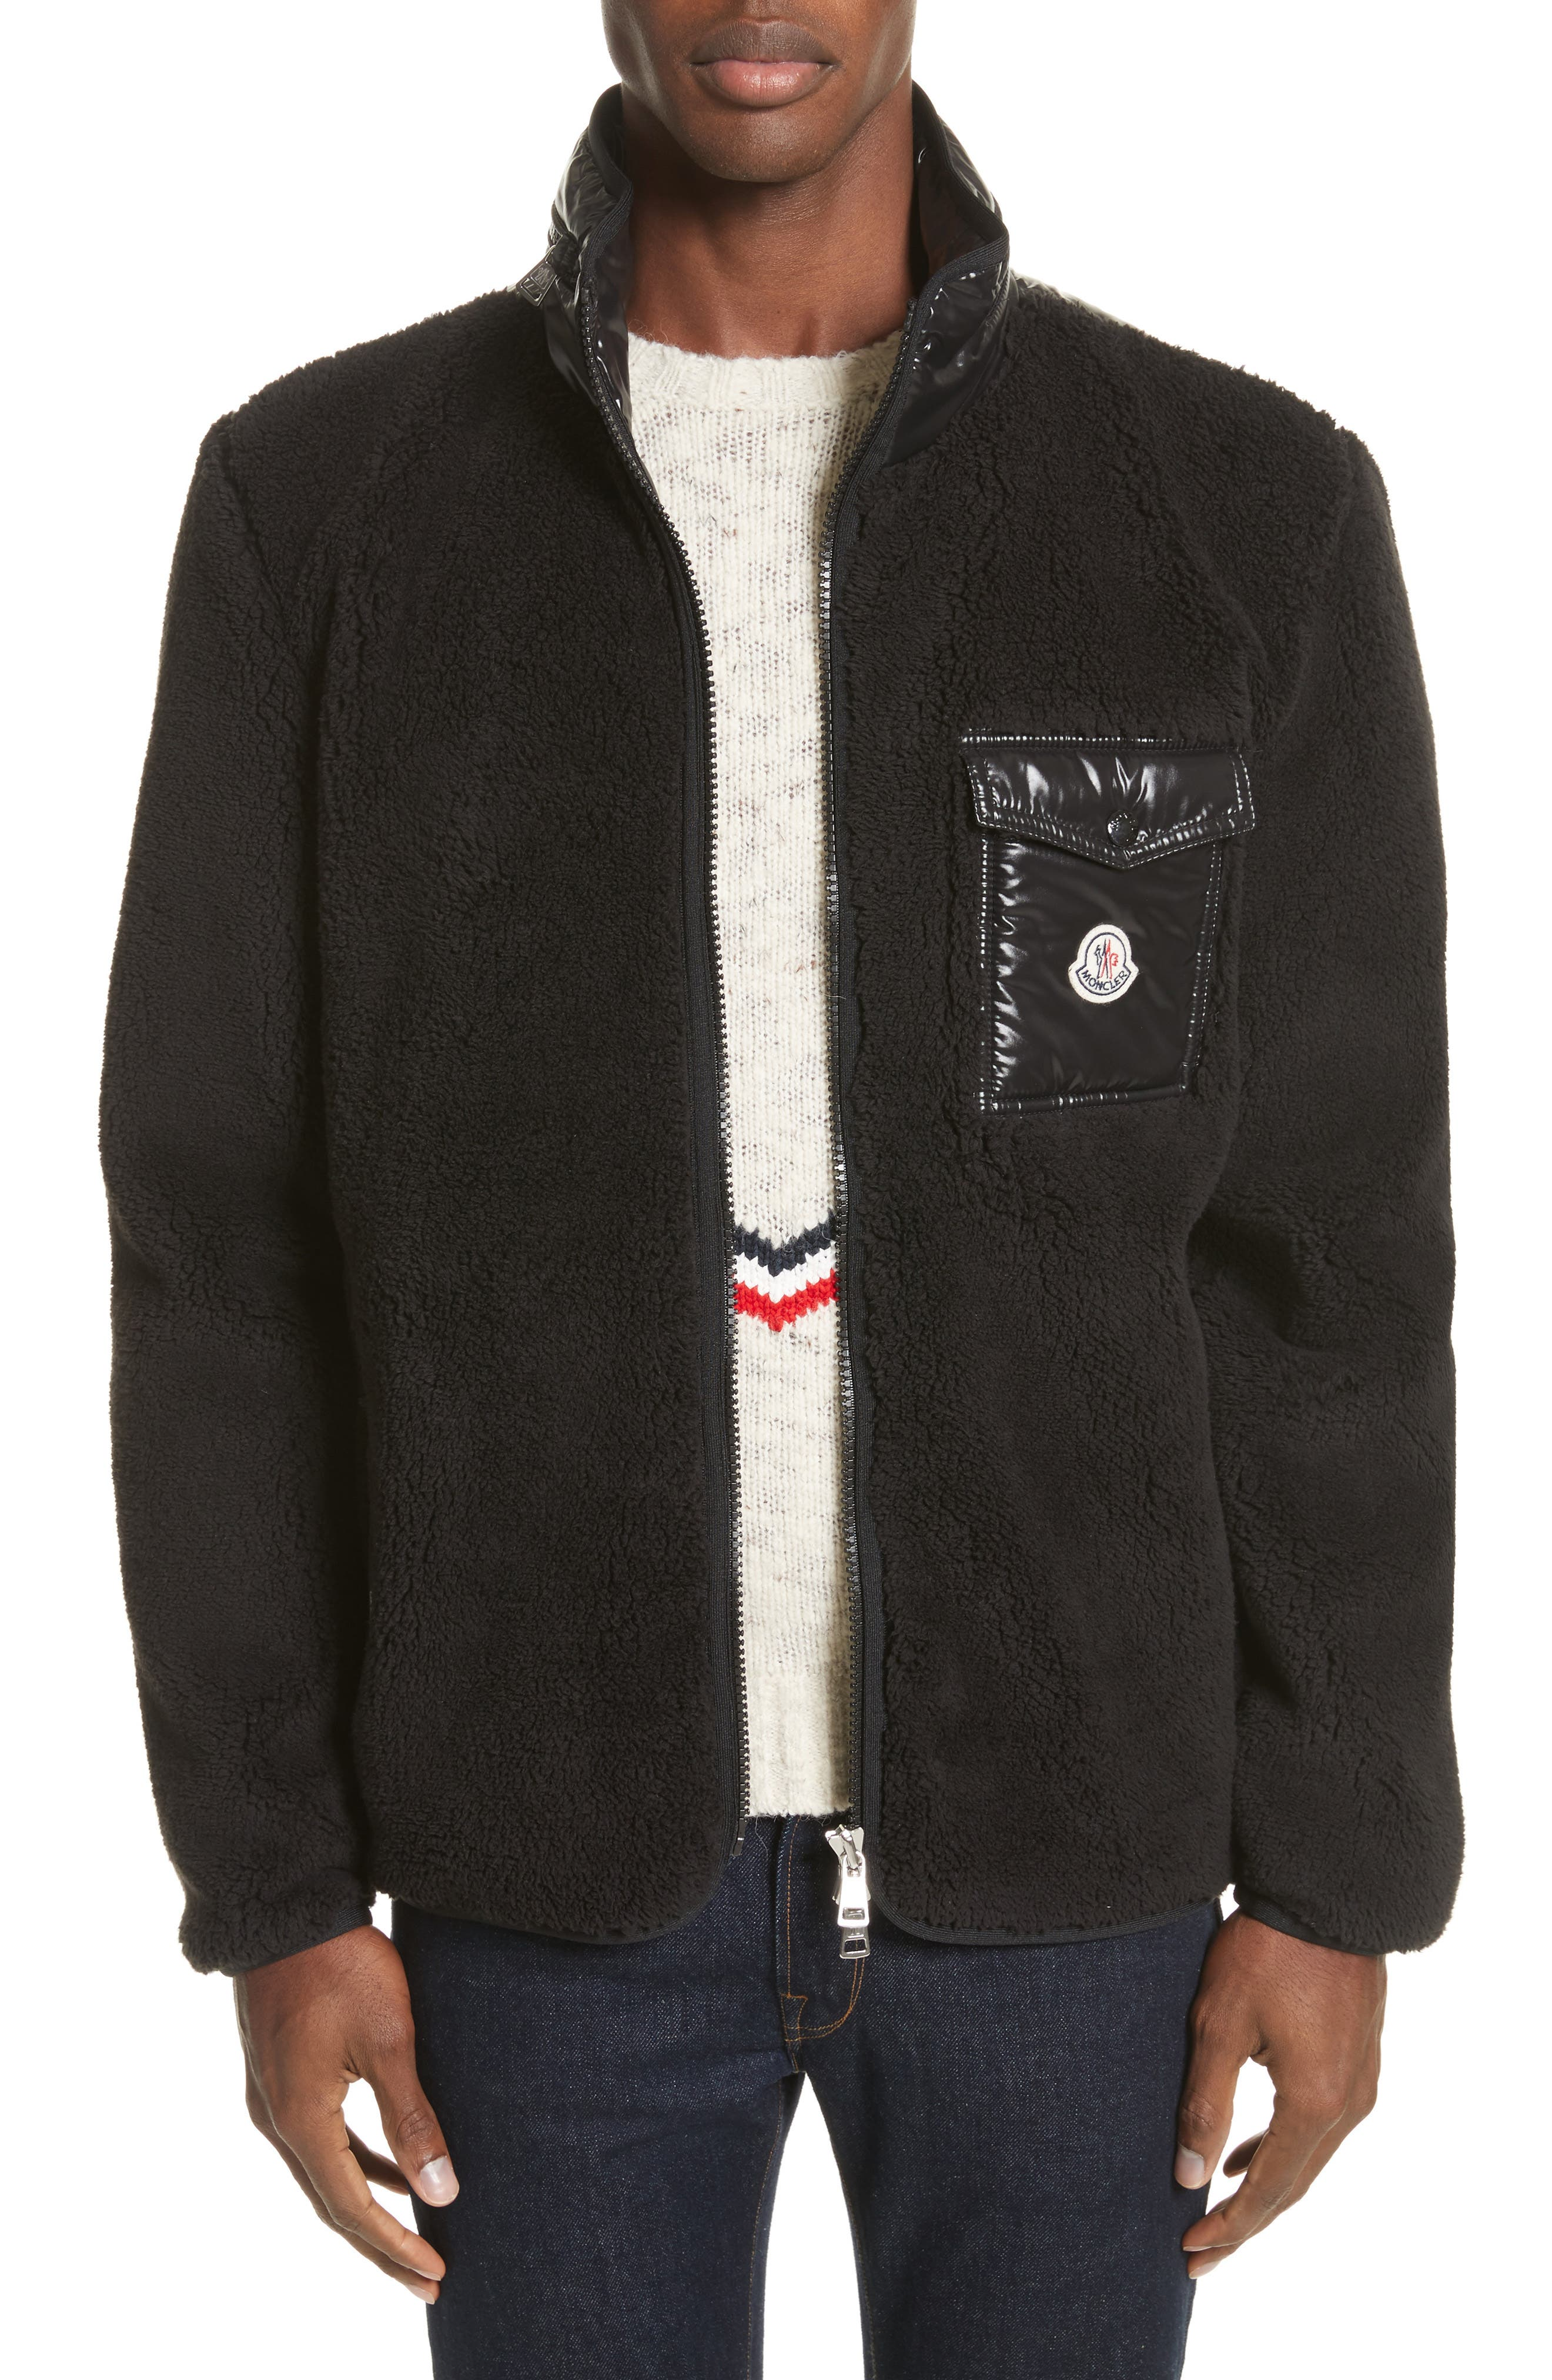 Alternate Image 1 Selected - Moncler Polar Fleece Zip Jacket